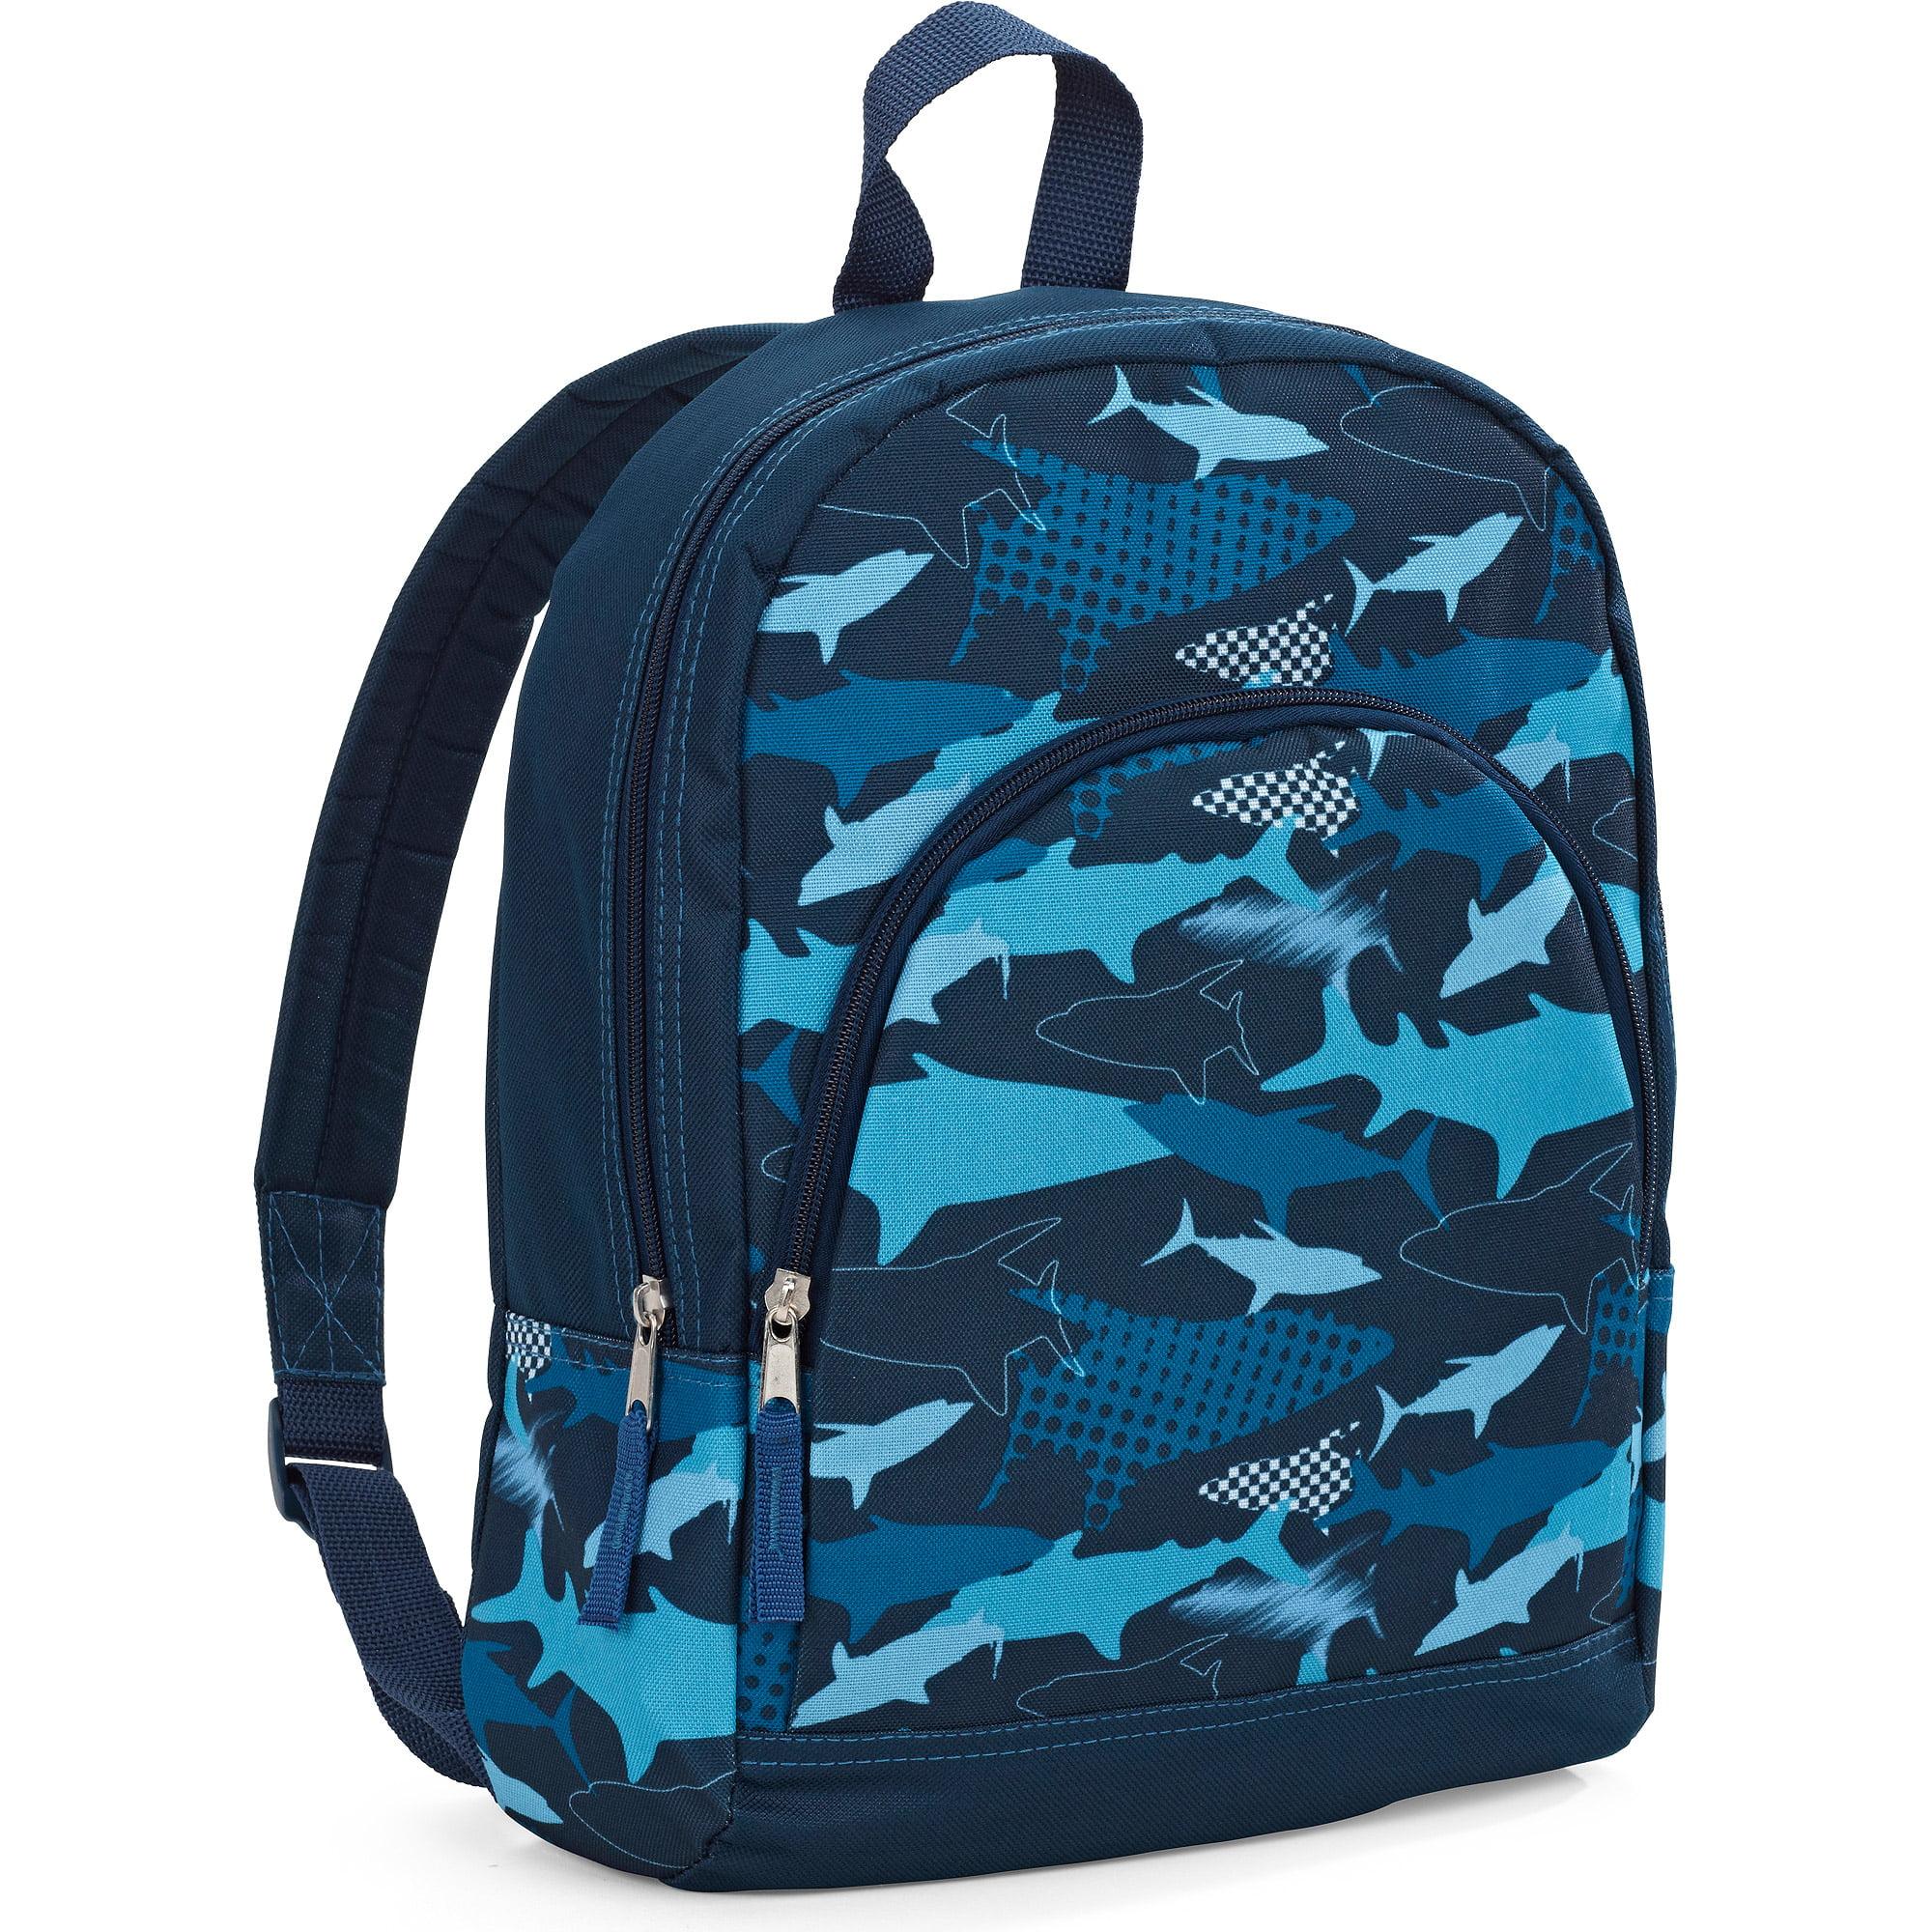 "15"" Printed Zip Front Pocket Backpack"